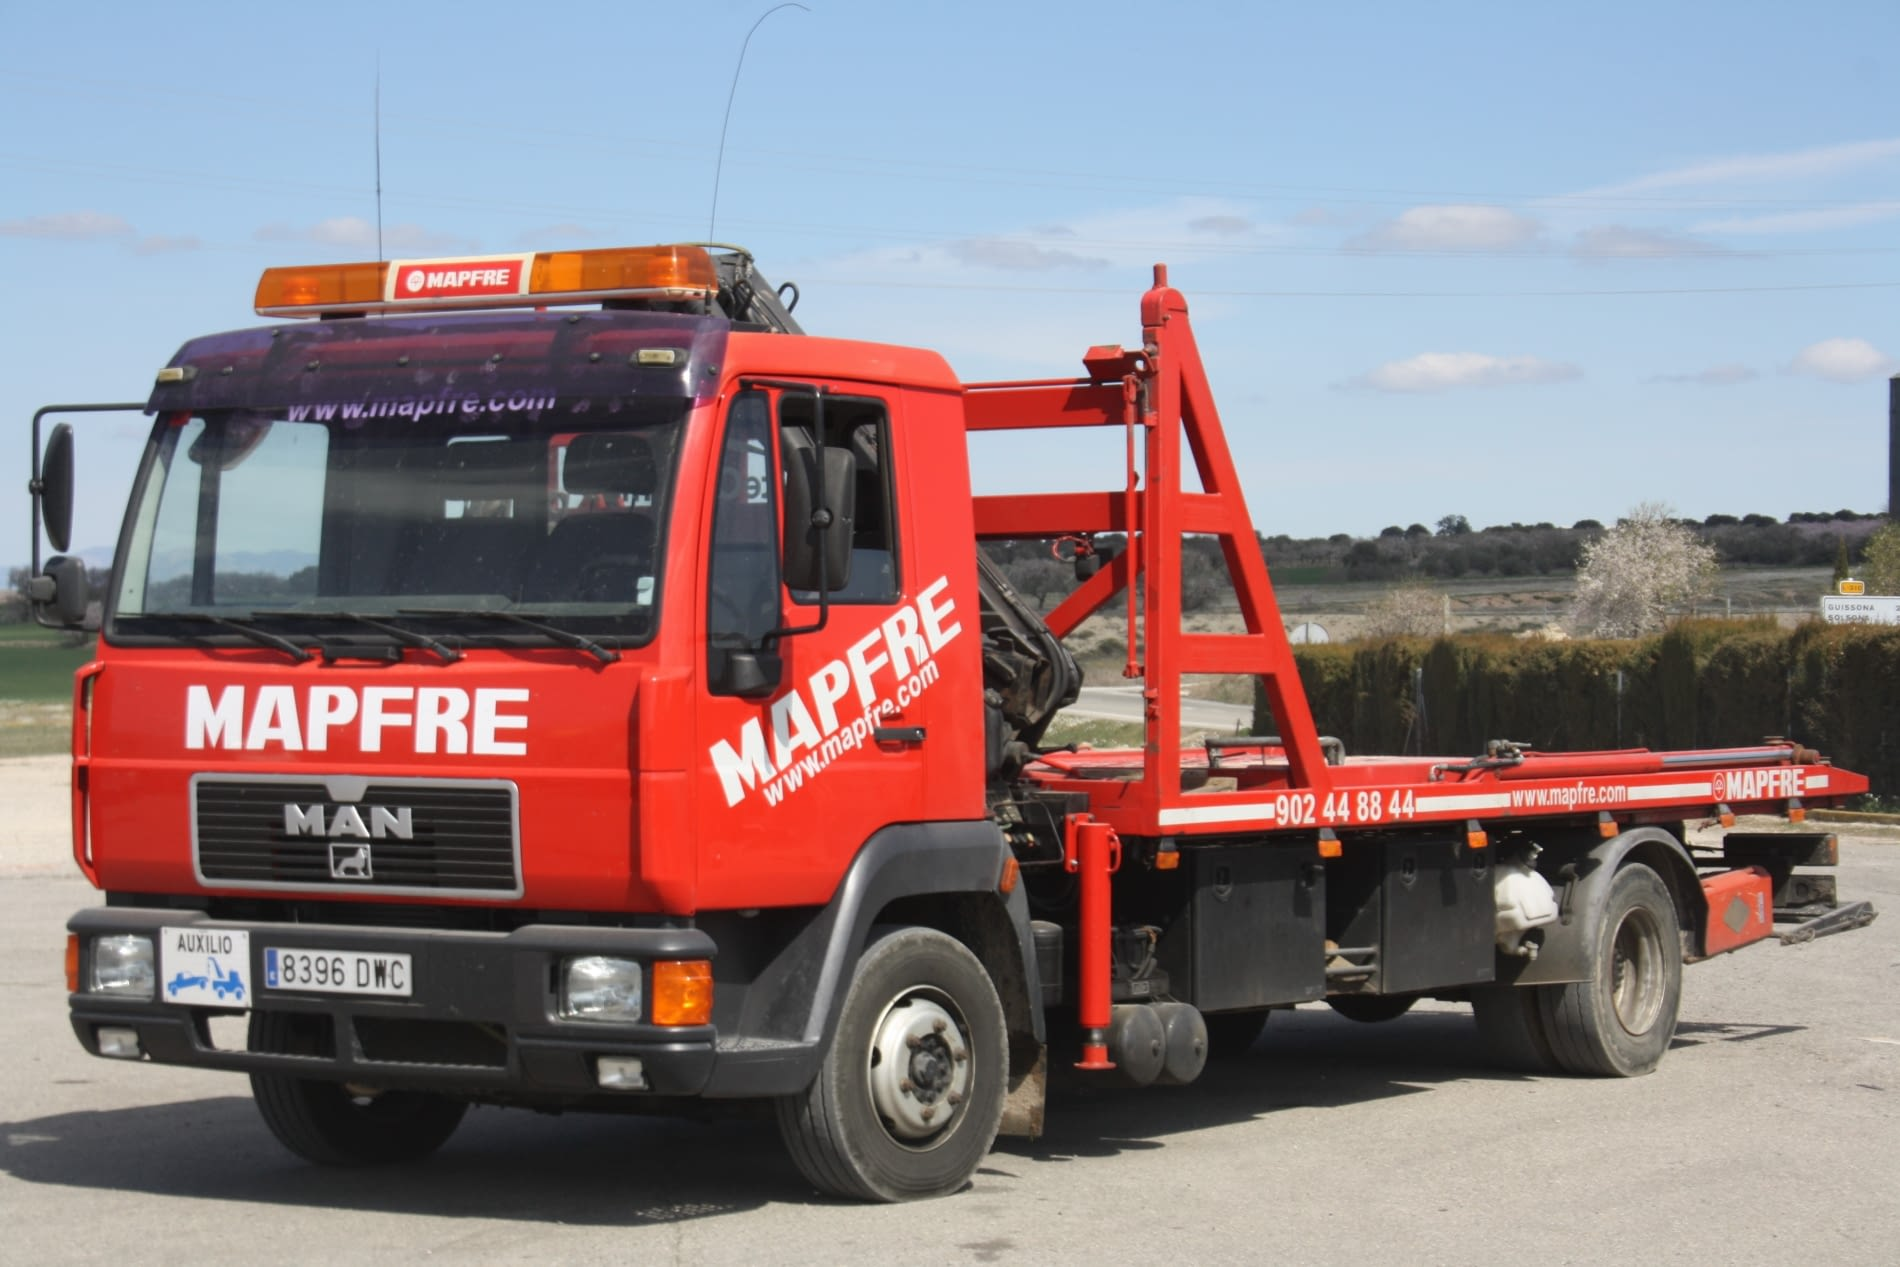 Camionet assistencia MAN mapfre